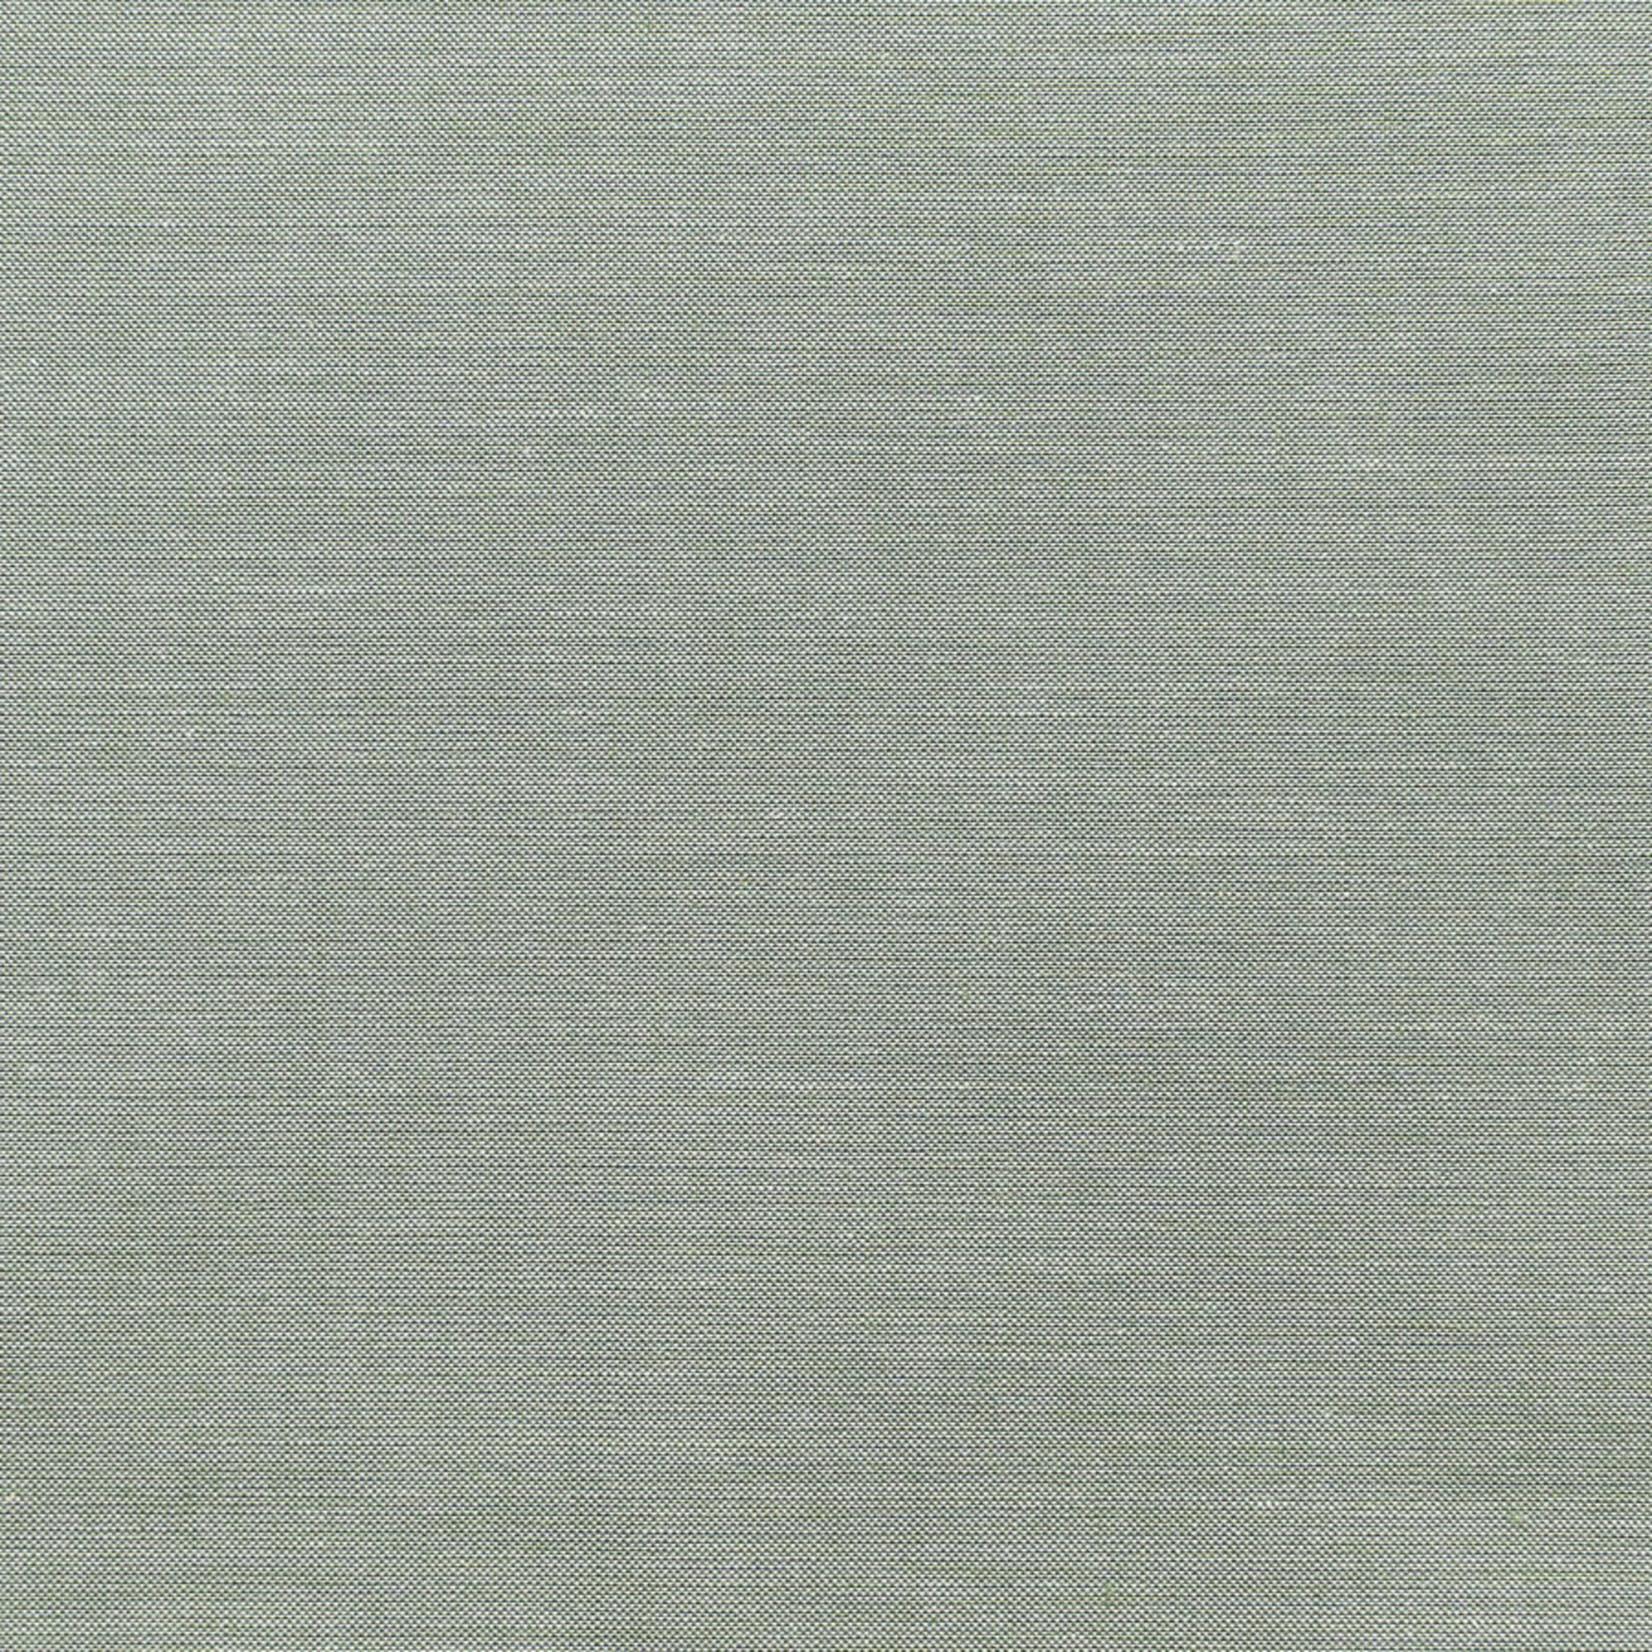 Tilda Gardenlife, Chambray, Sage 160011 $0.22 per cm or $22/m